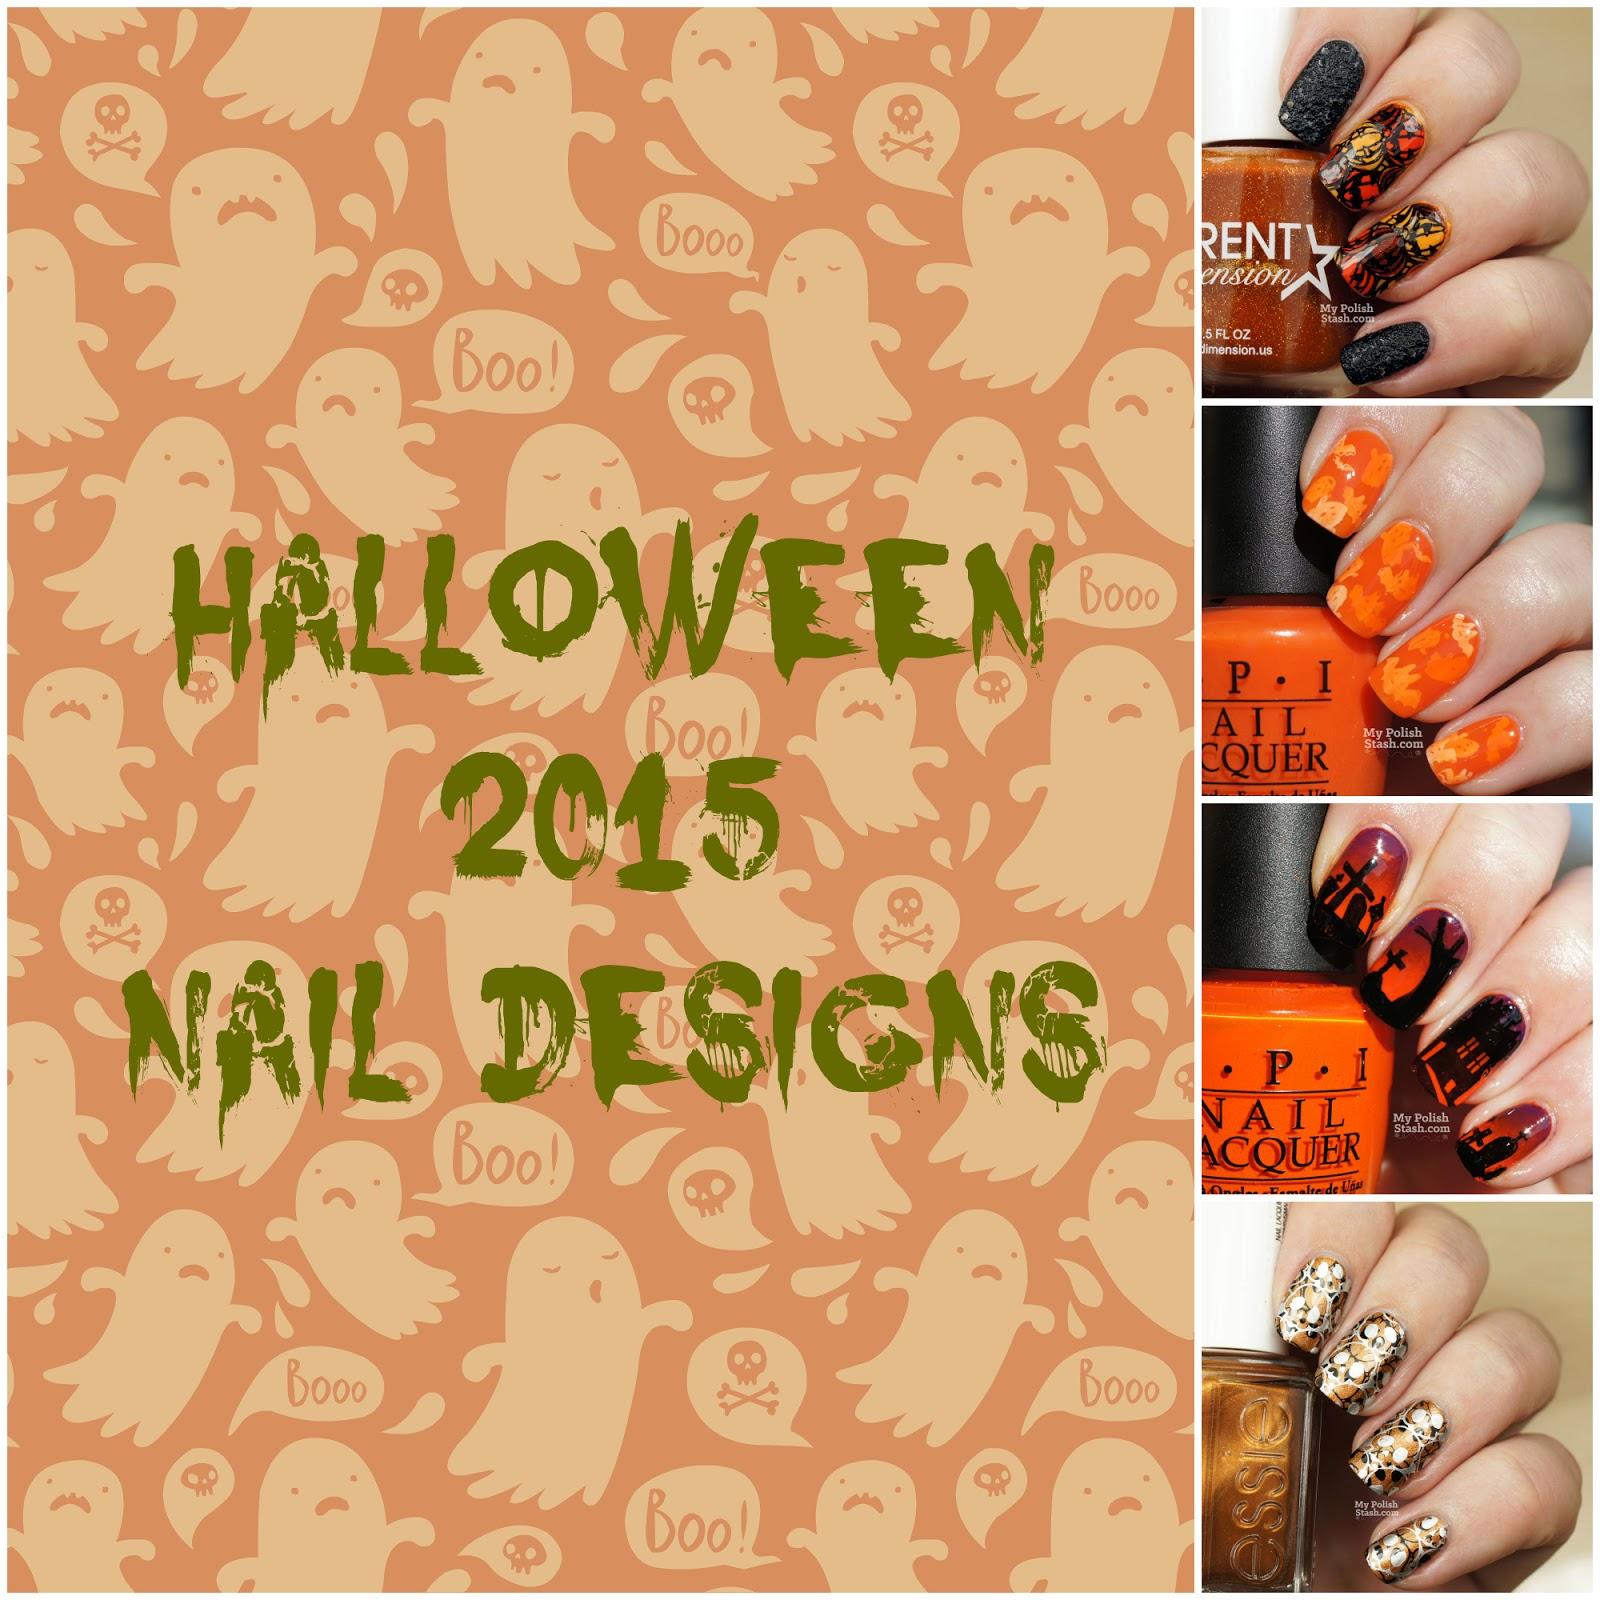 spooktober halloween nails